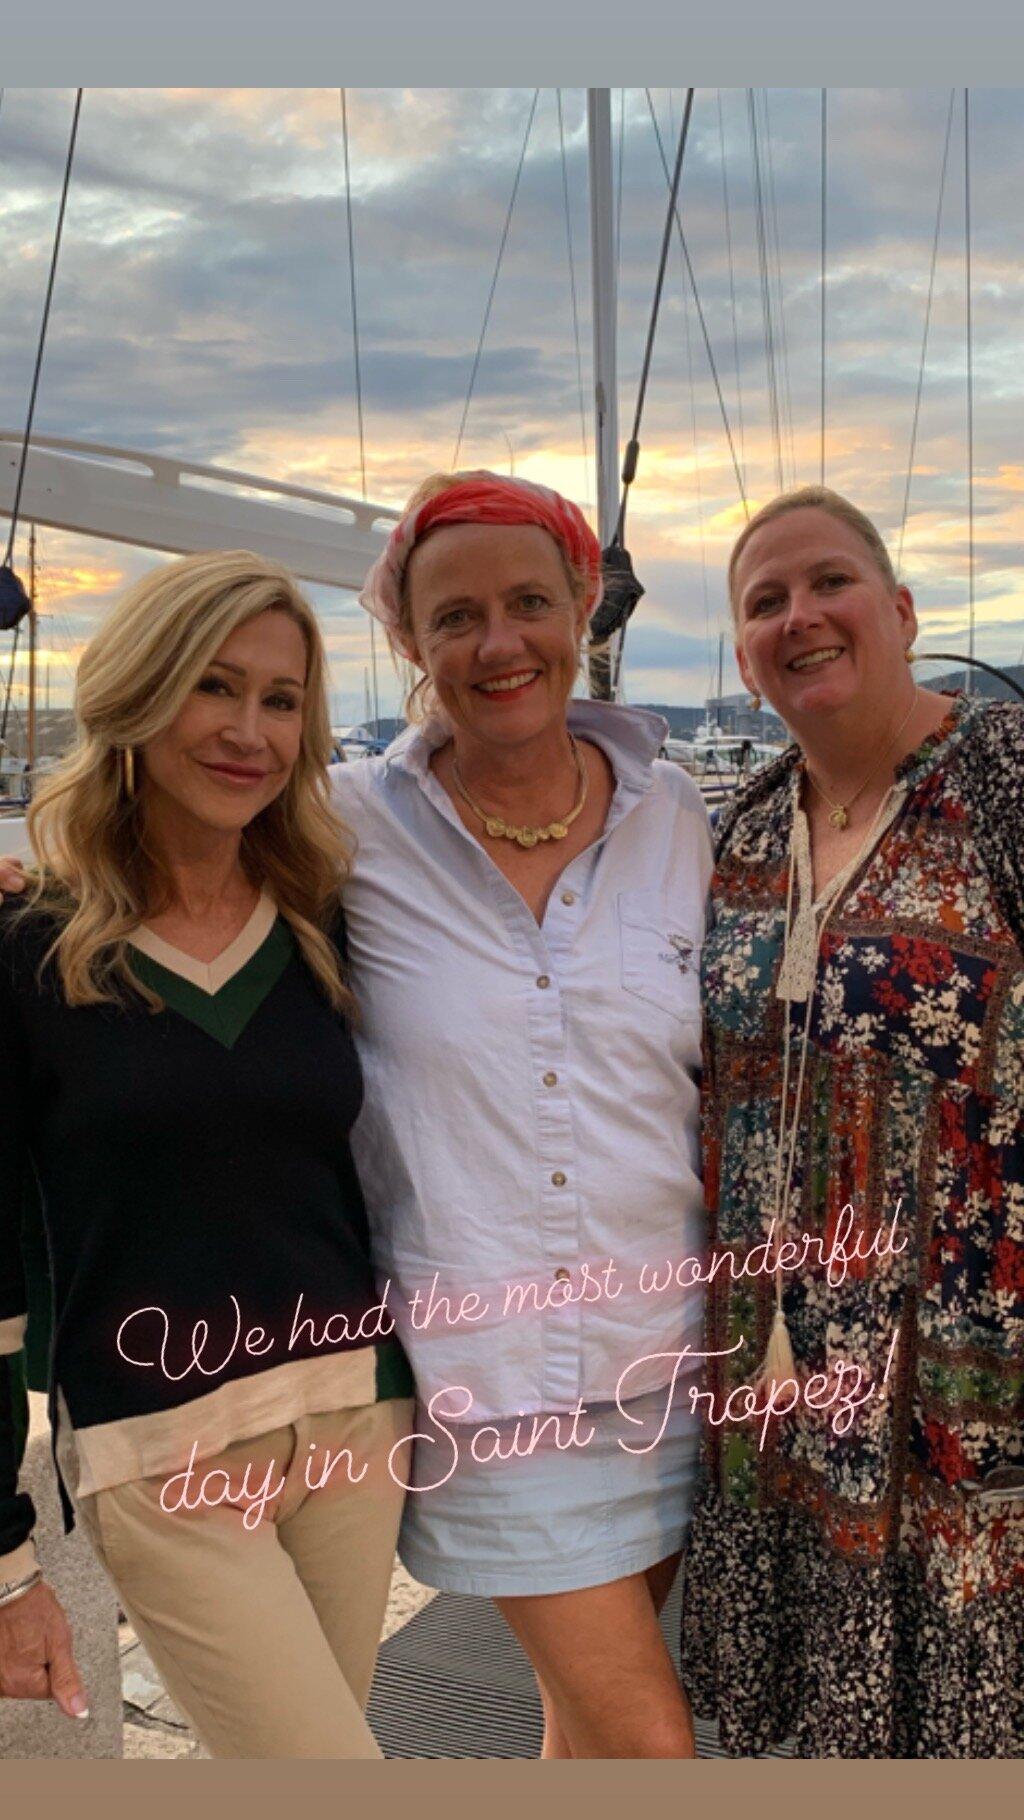 Friends in Saint-Tropez - Crazy Blonde Life